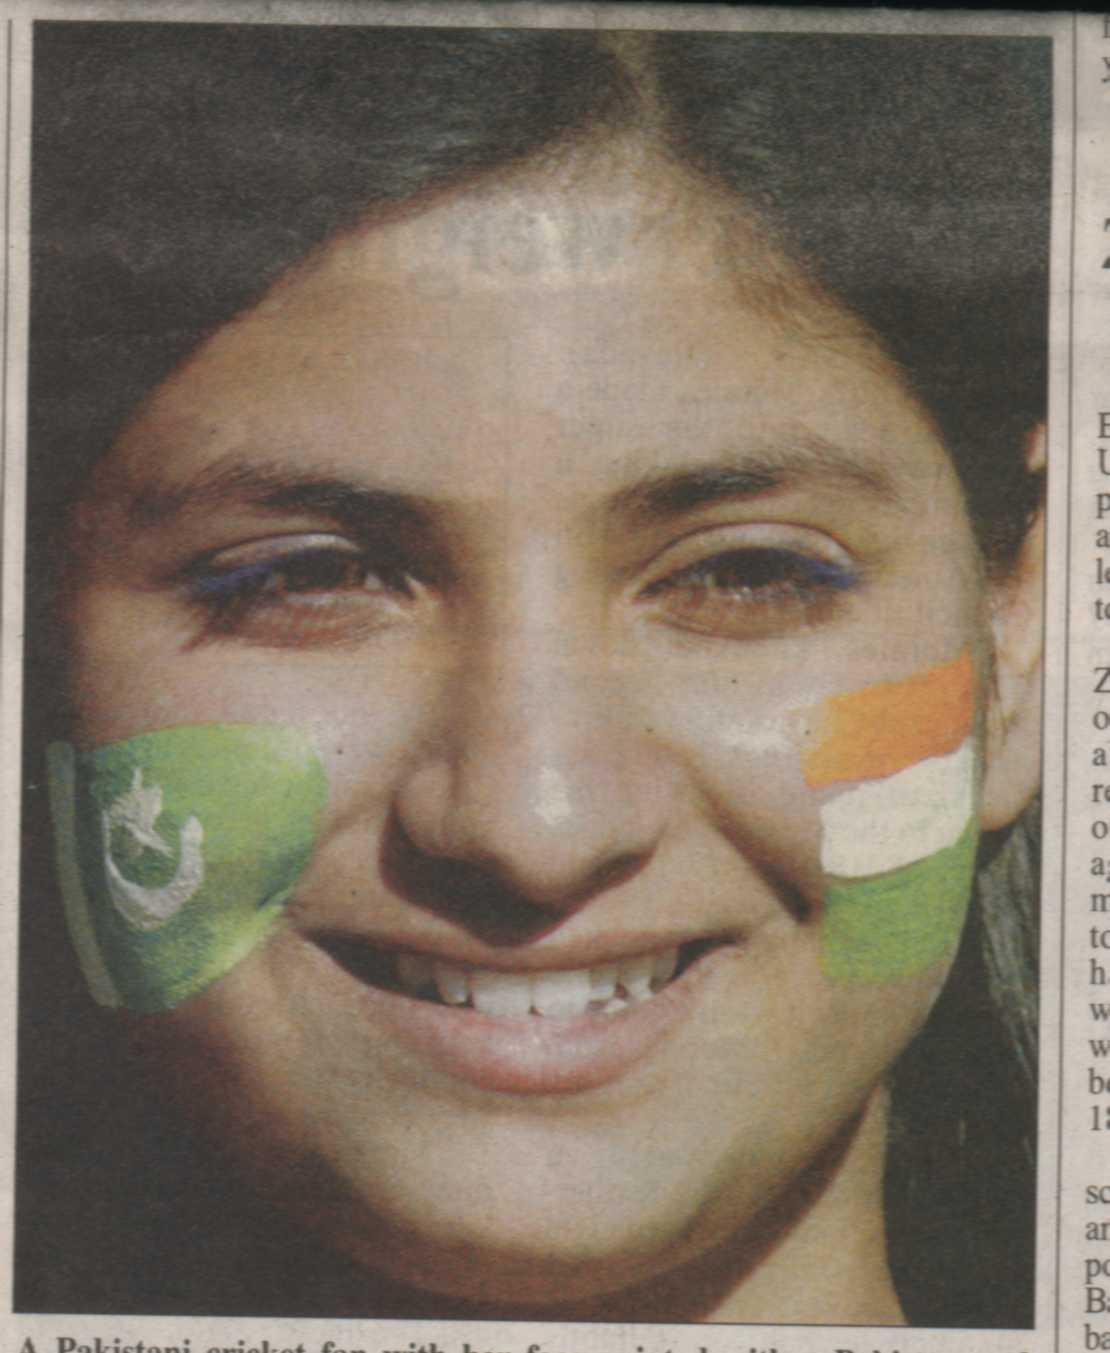 A Pakistani Girl Promoting Peace between Pakistan and India